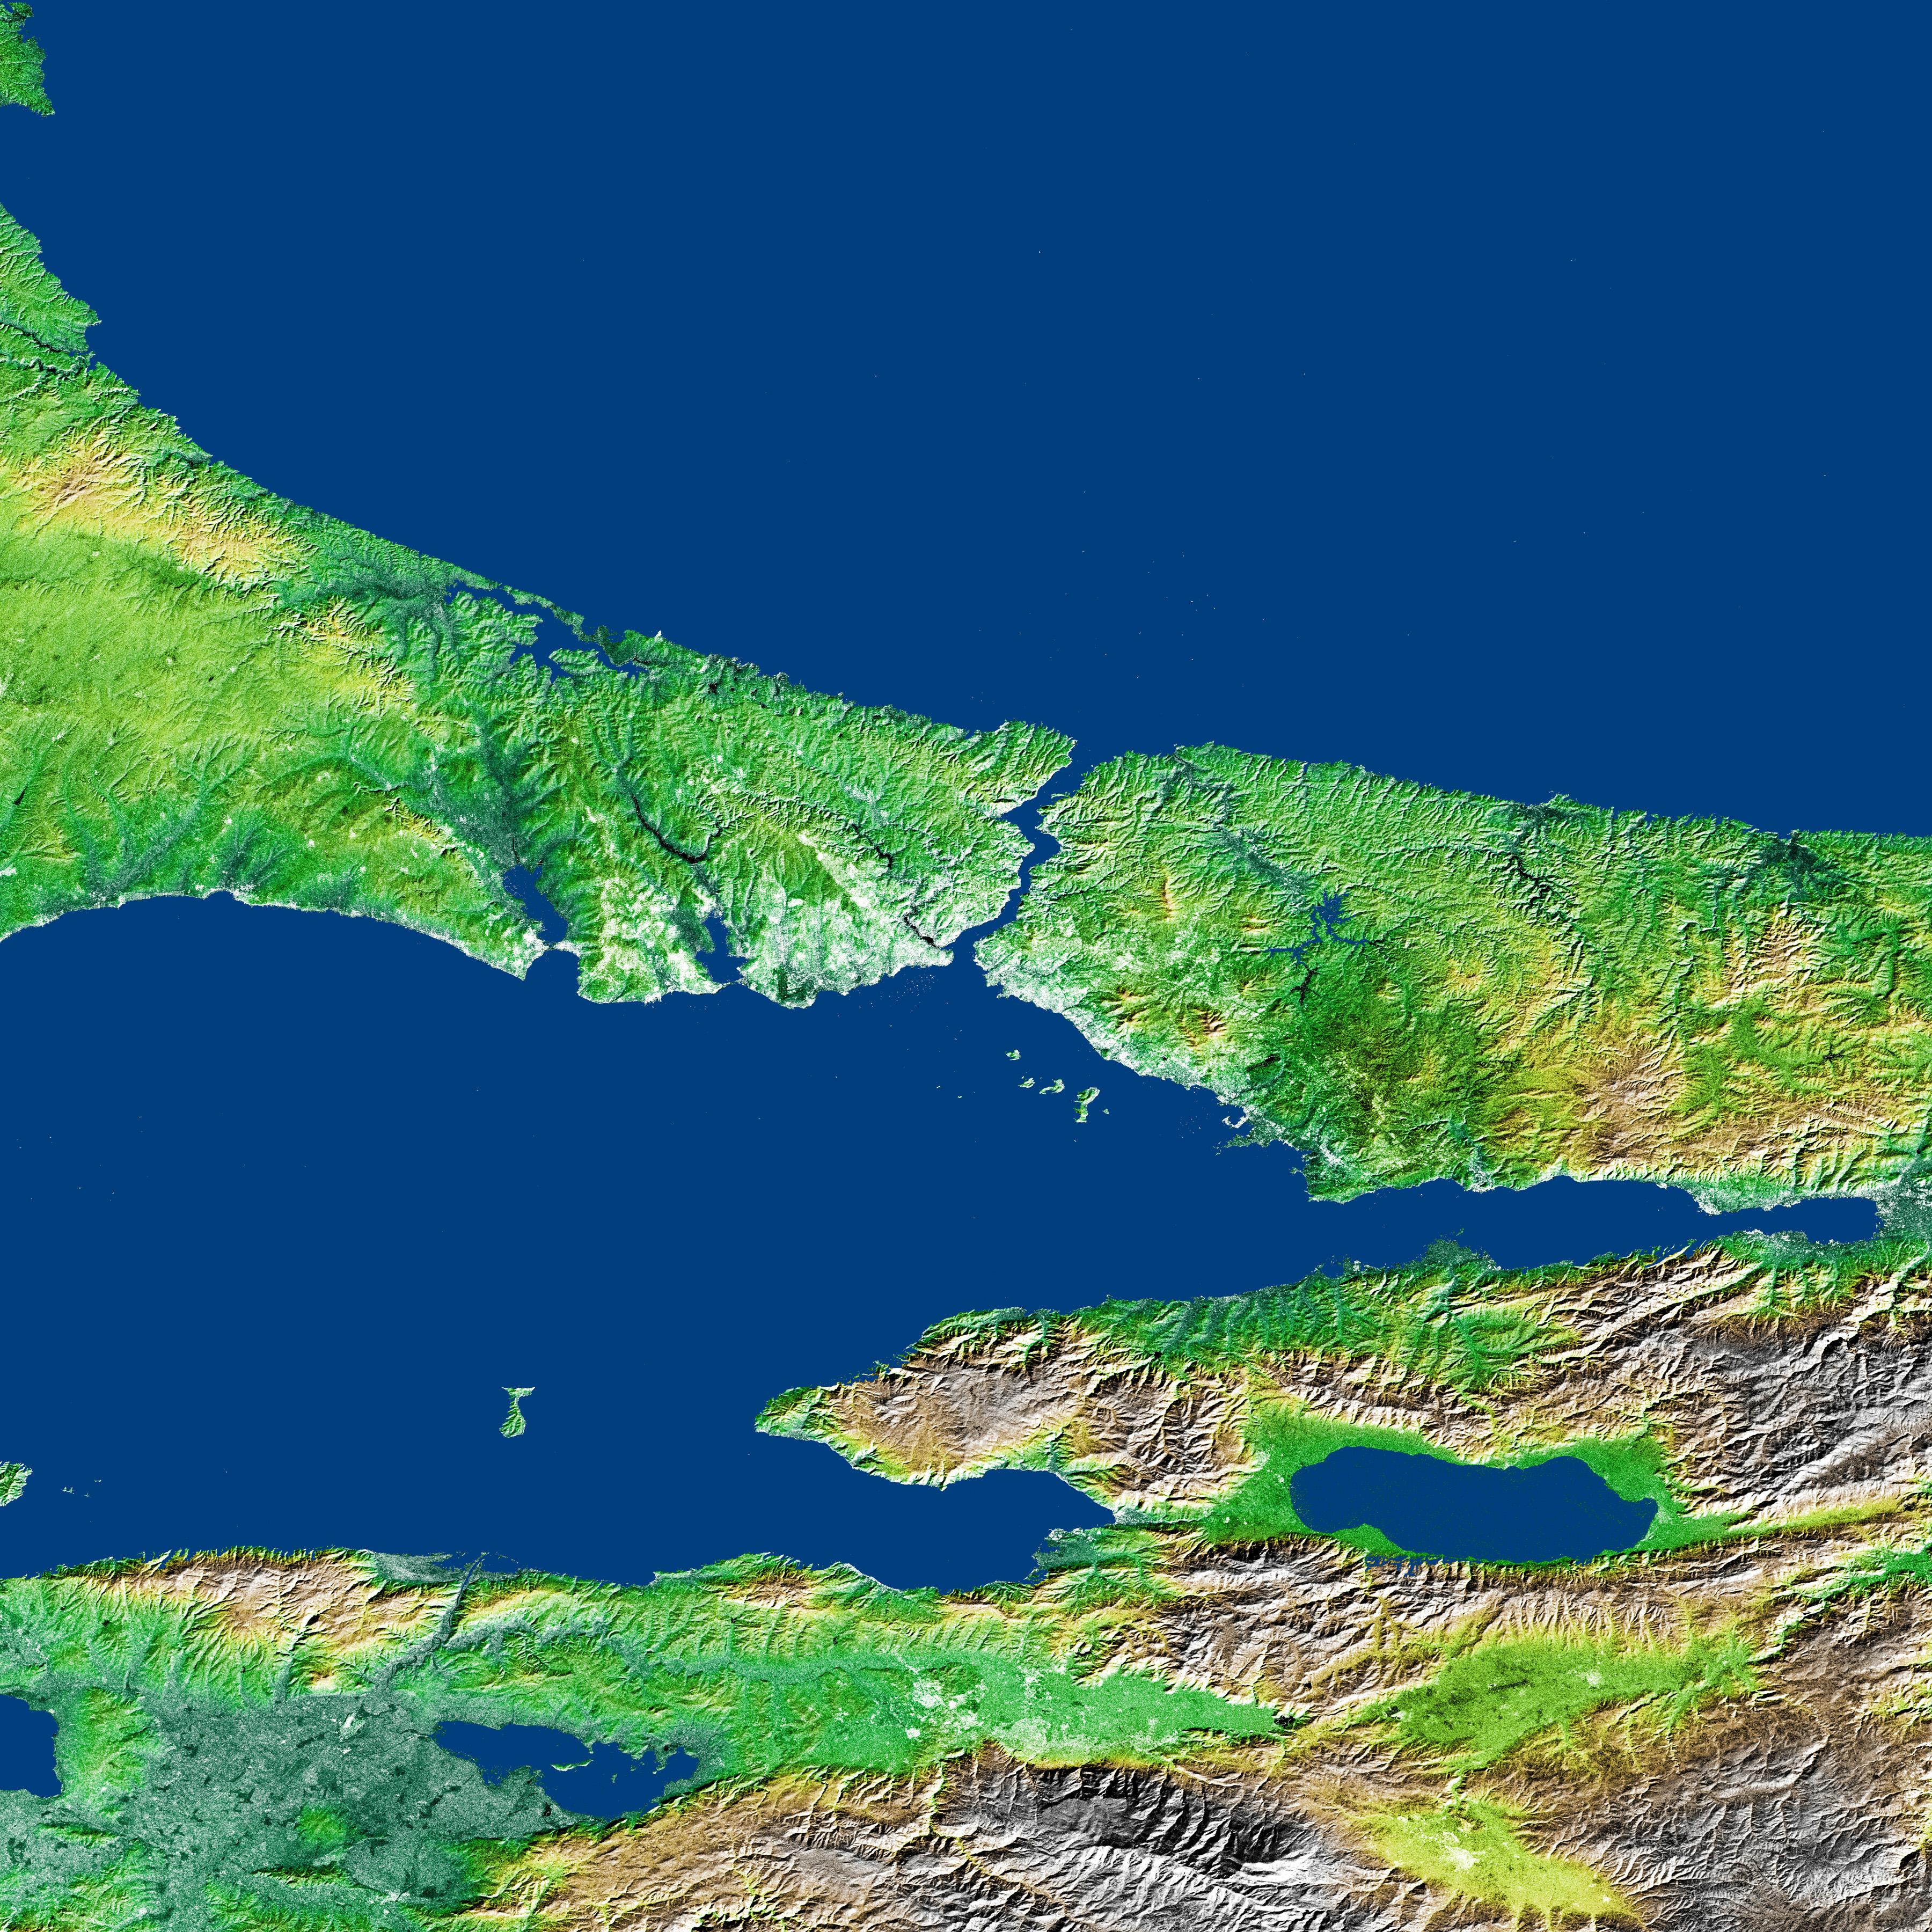 Bosporus Strait And Istanbul, Turkey : Image Of The Day